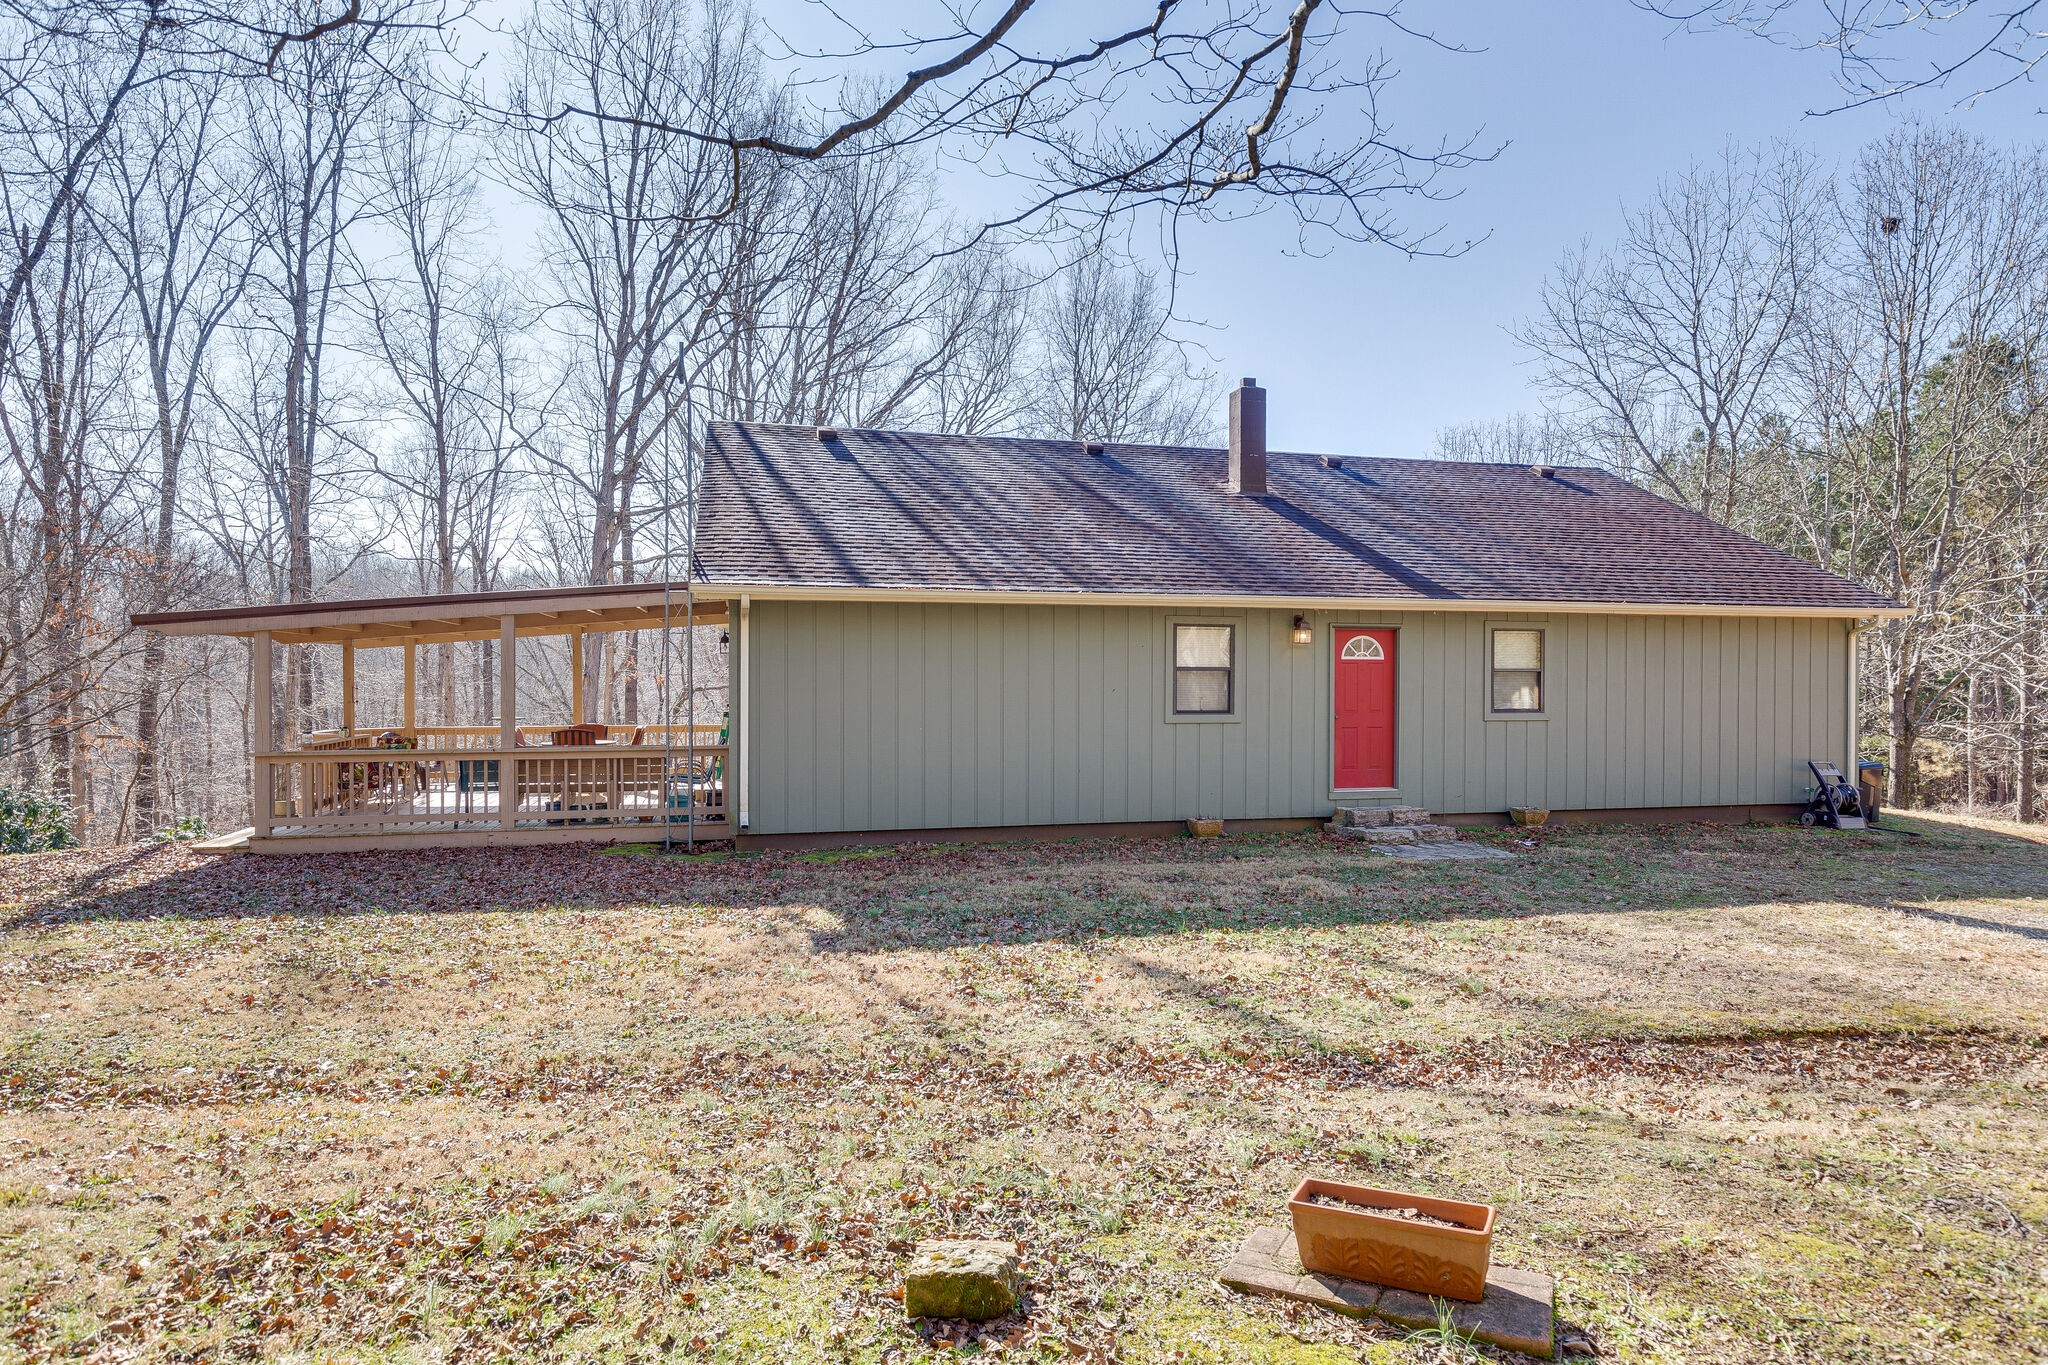 124 Denicolais Dr Property Photo - Hohenwald, TN real estate listing